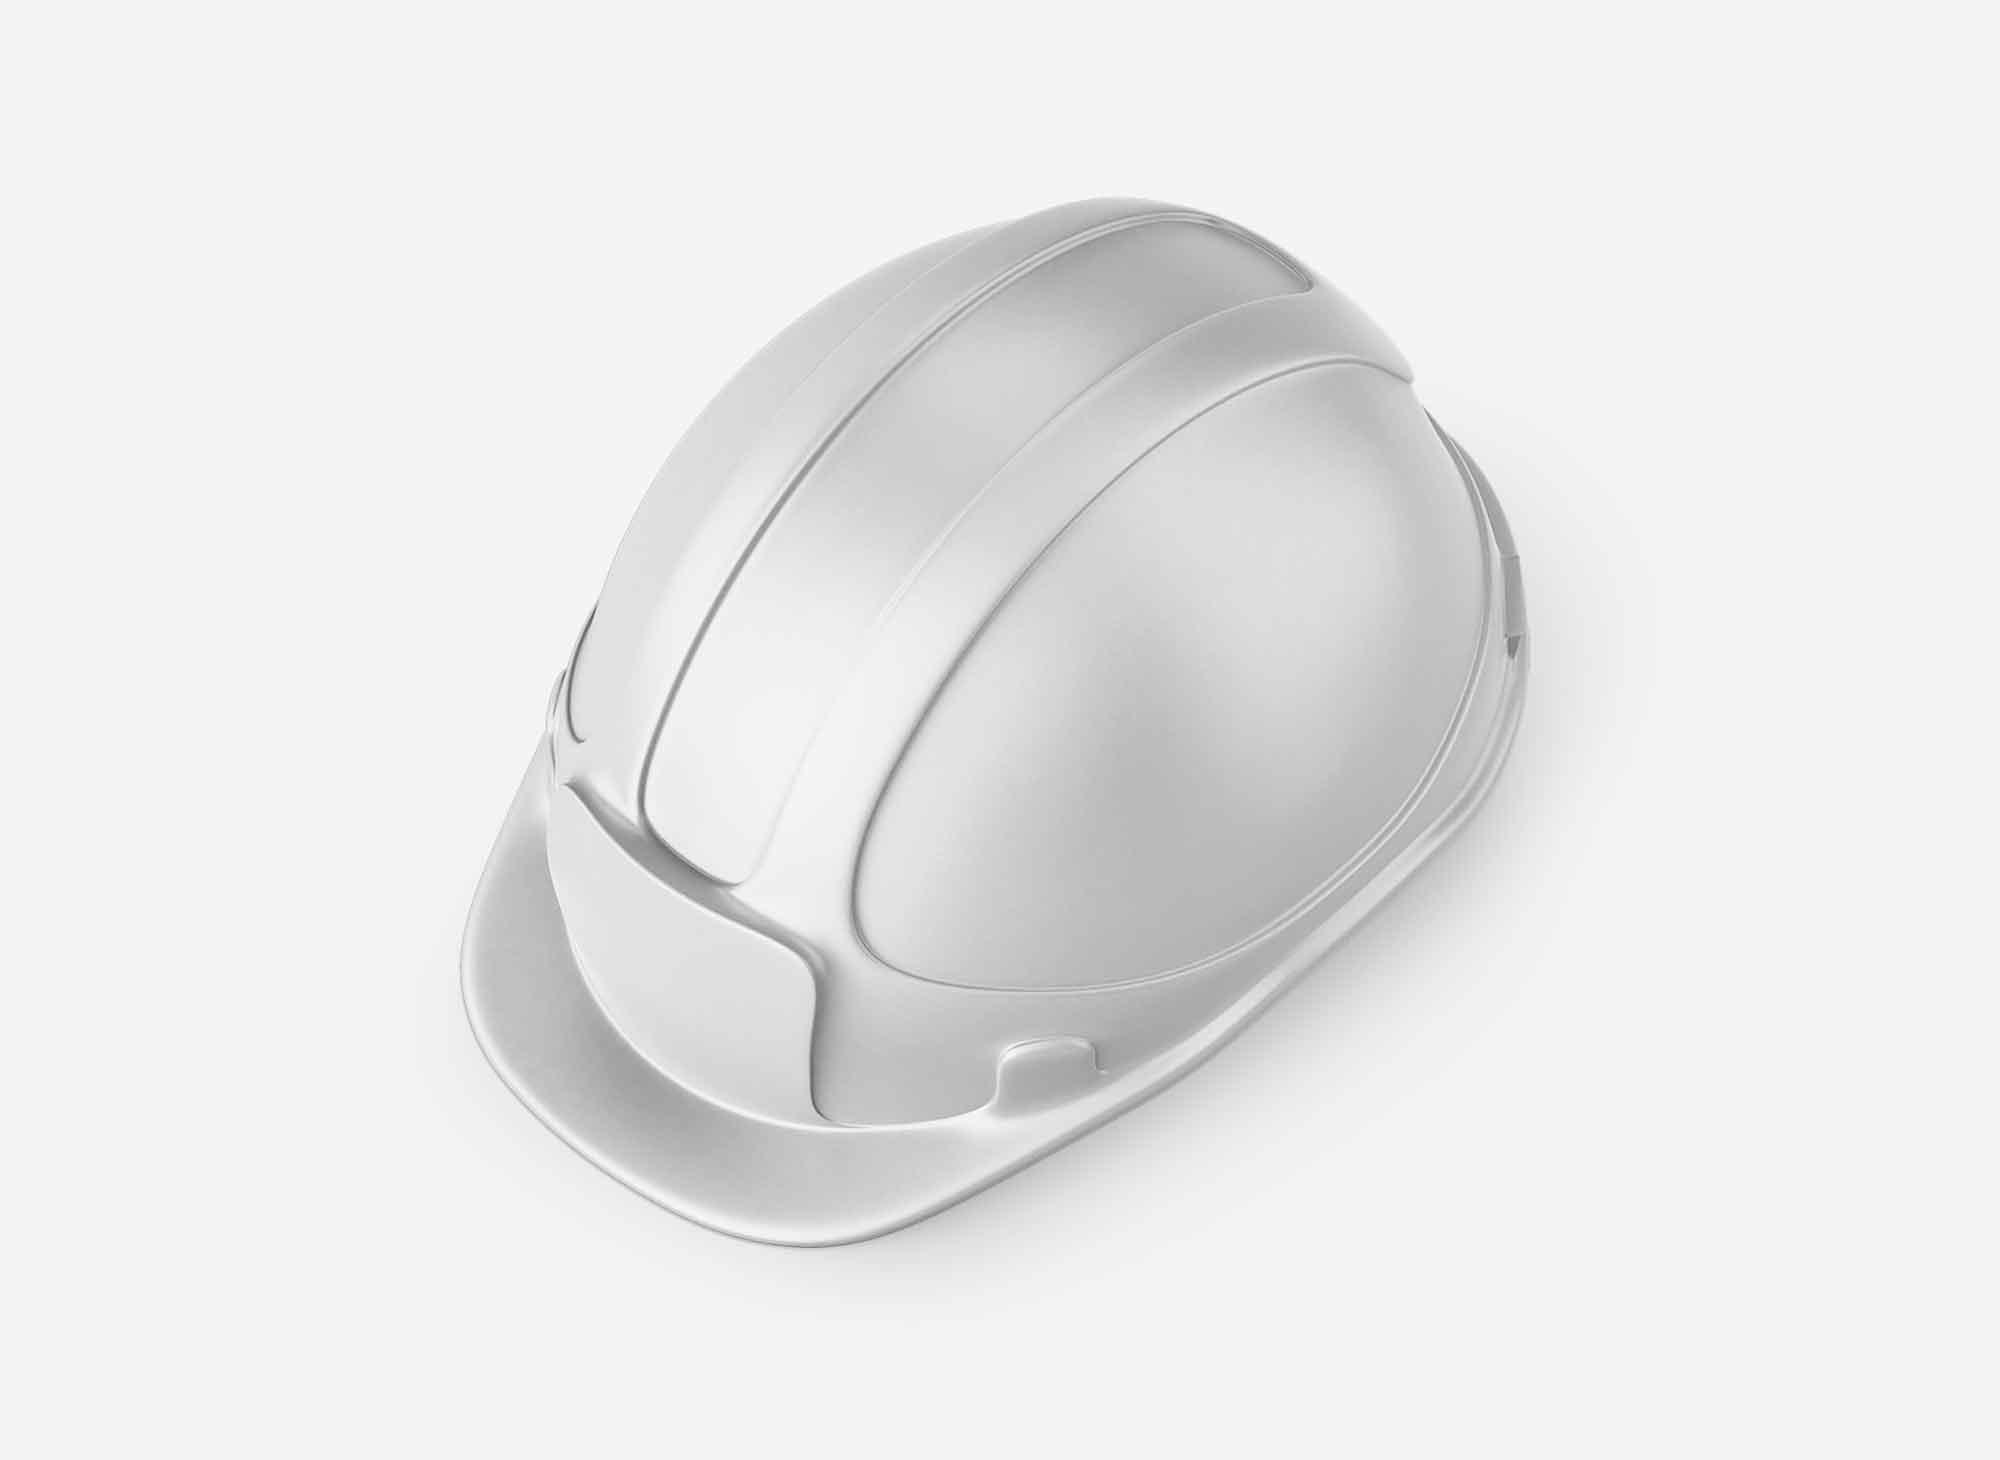 Construction Hard Hat Mockup 2